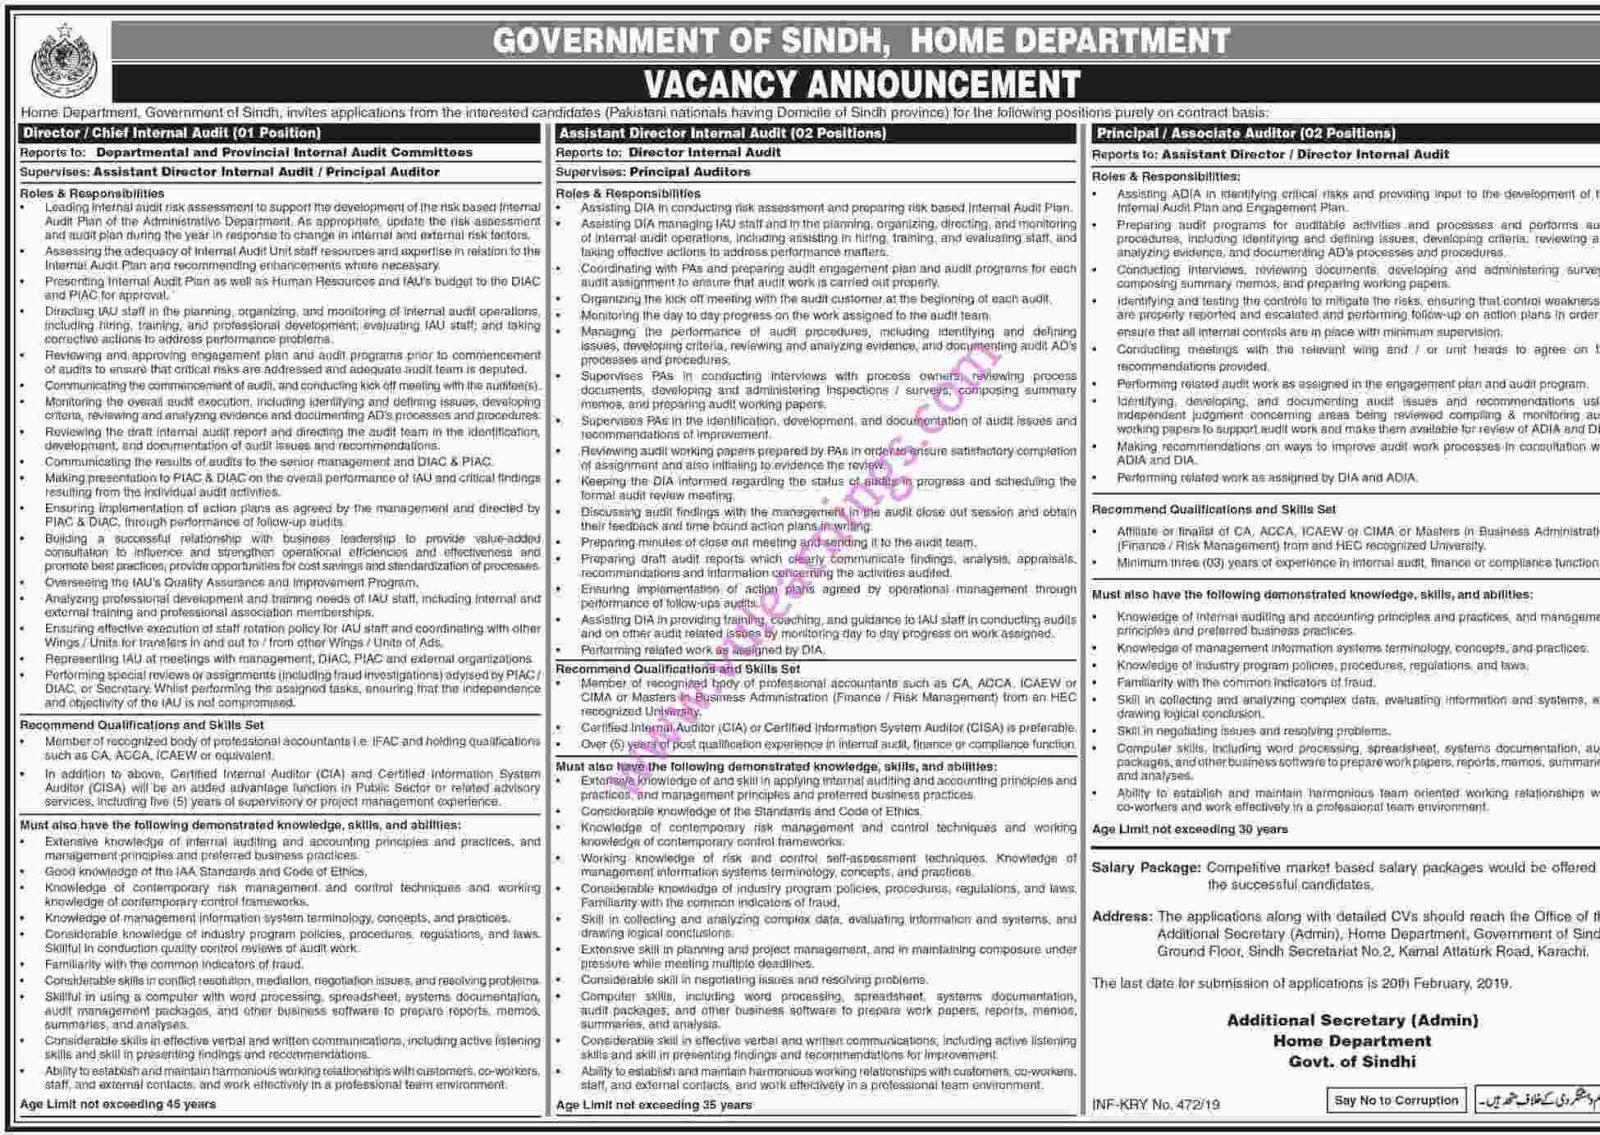 Govt of Sindh Home Department Jobs 2019 Vacancies Advertisement Latest job